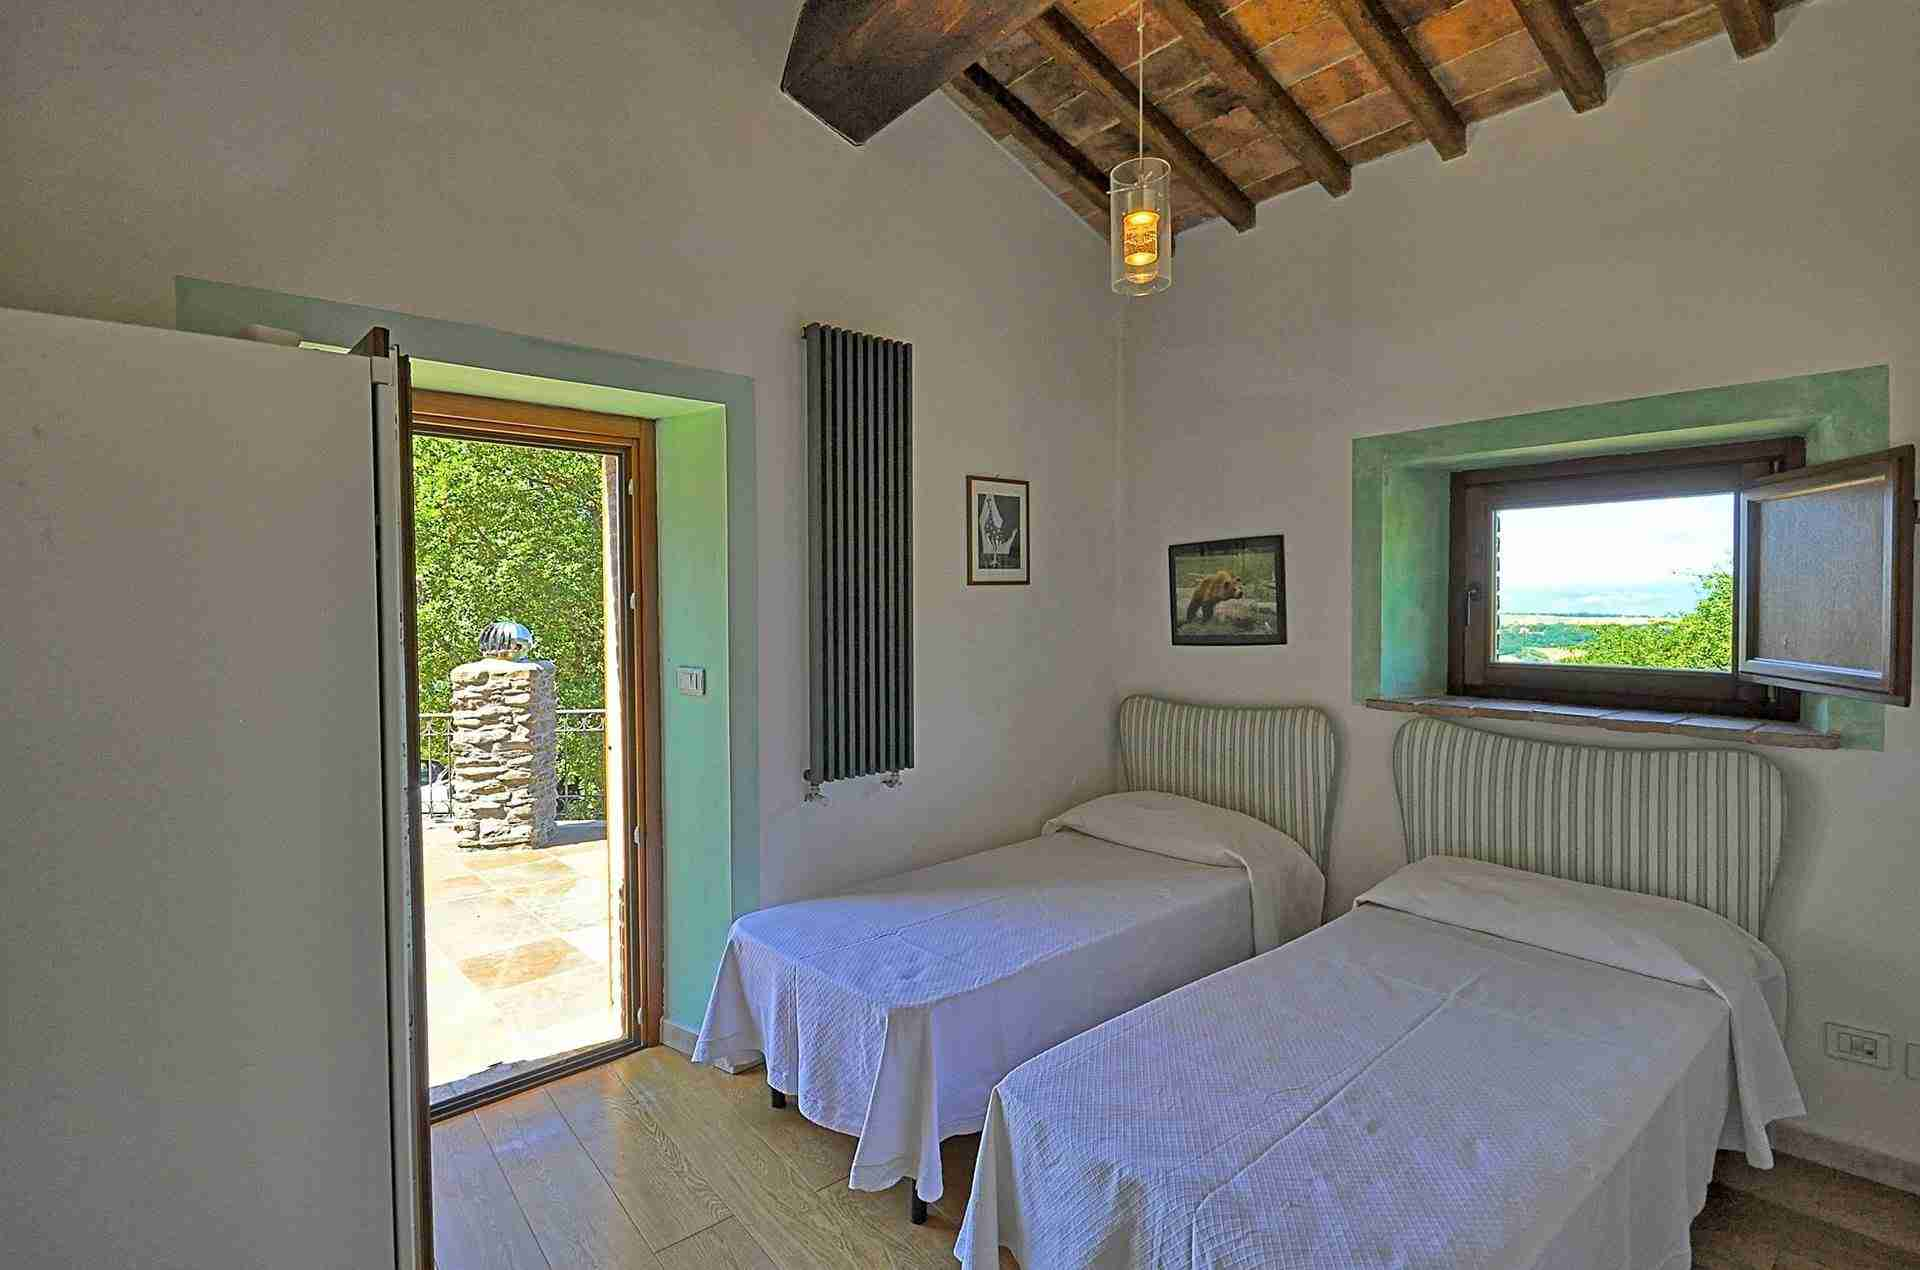 13 Perugini twin bedroom